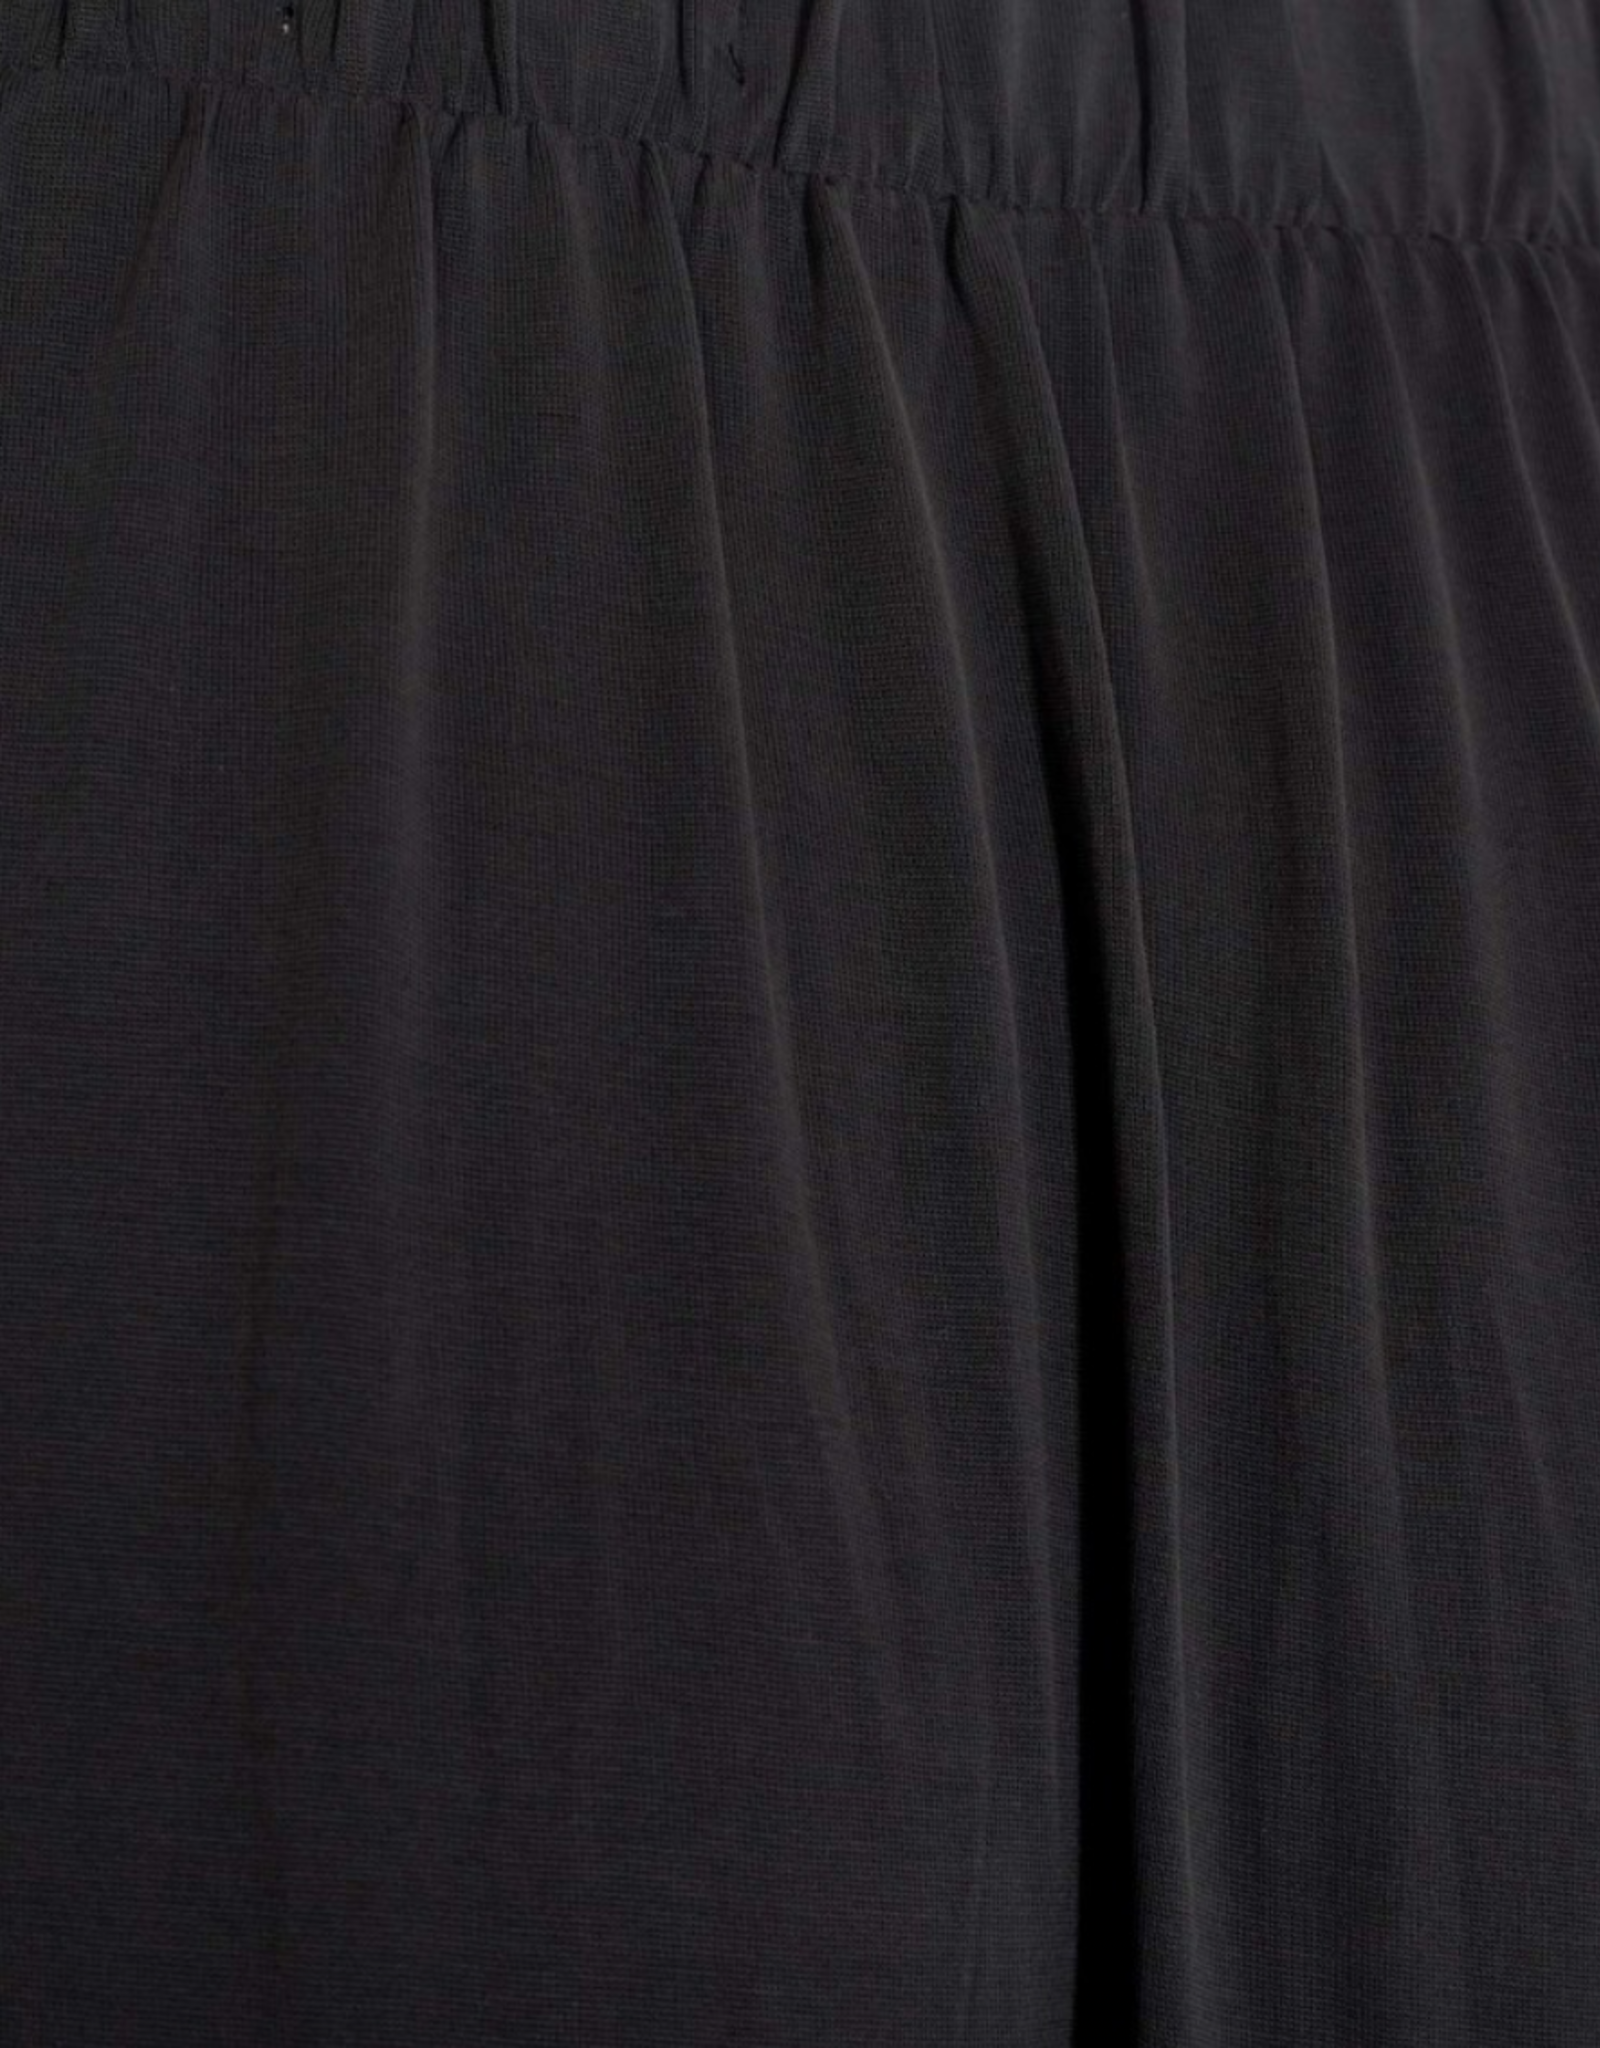 Minimum Regisse Midi Skirt